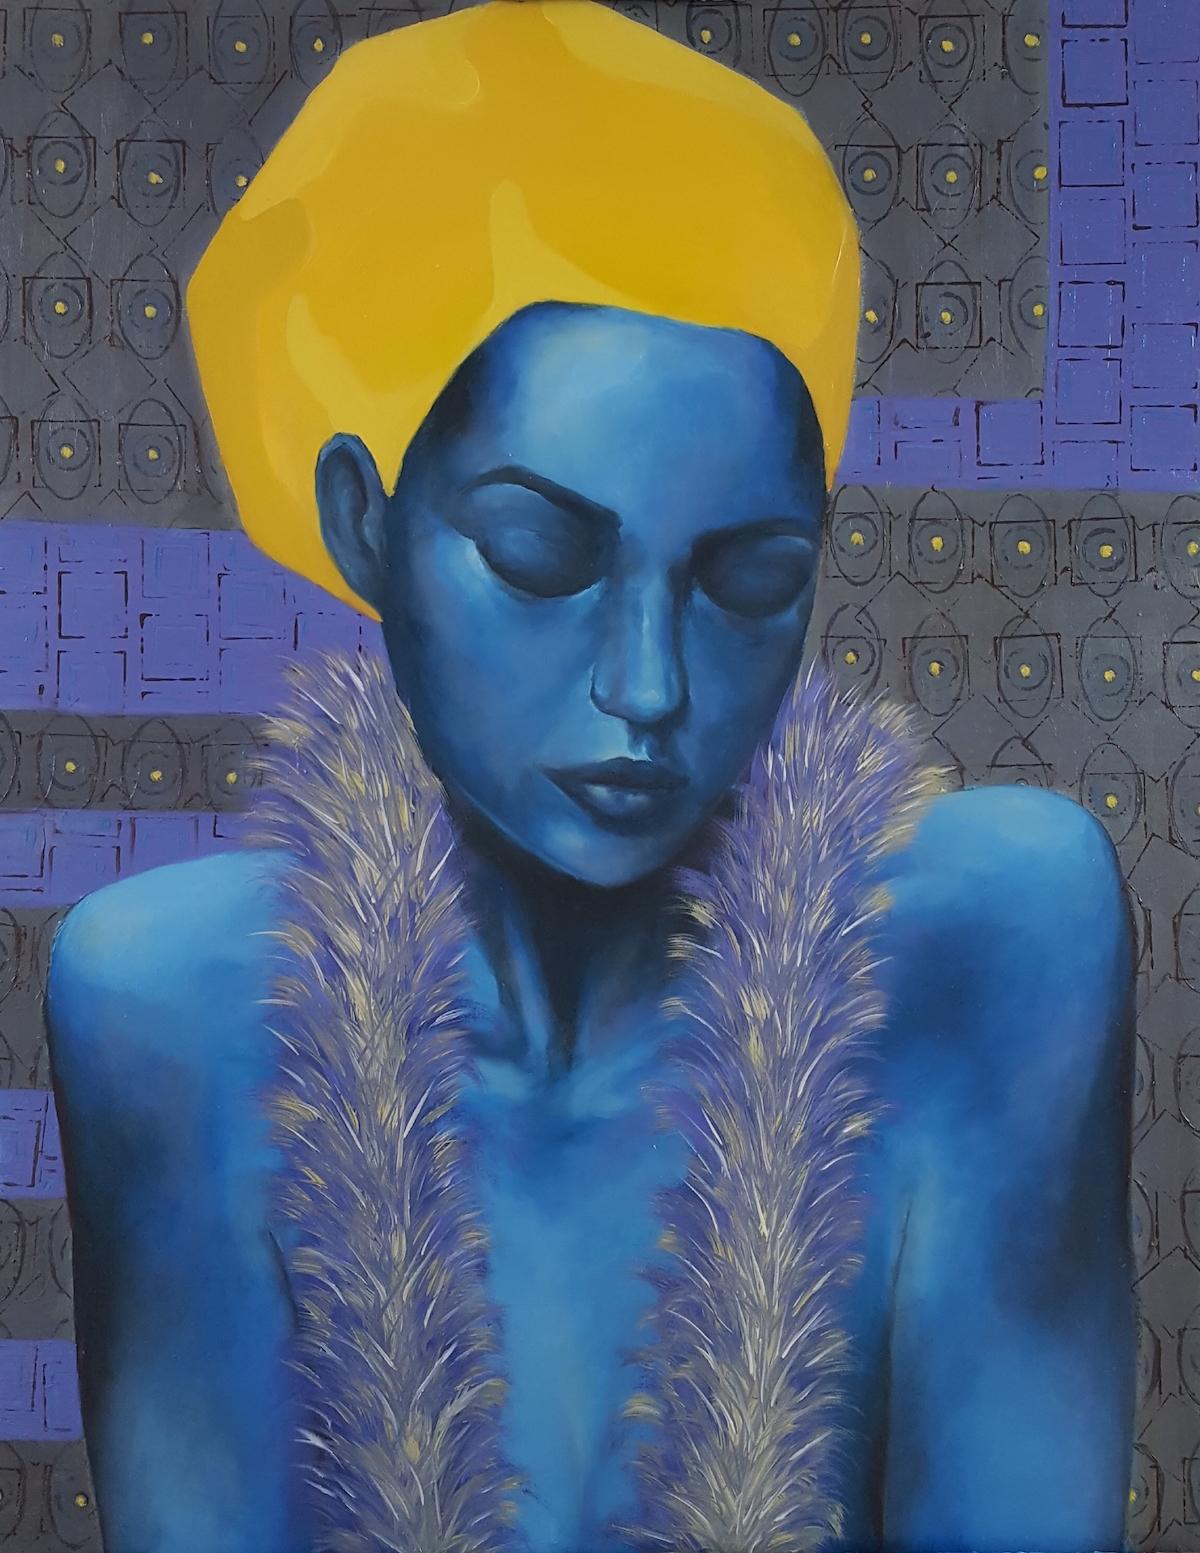 Blue woman 2. Pastels, Acrylics & oils on canvas. 59.5 x 76cm.jpg